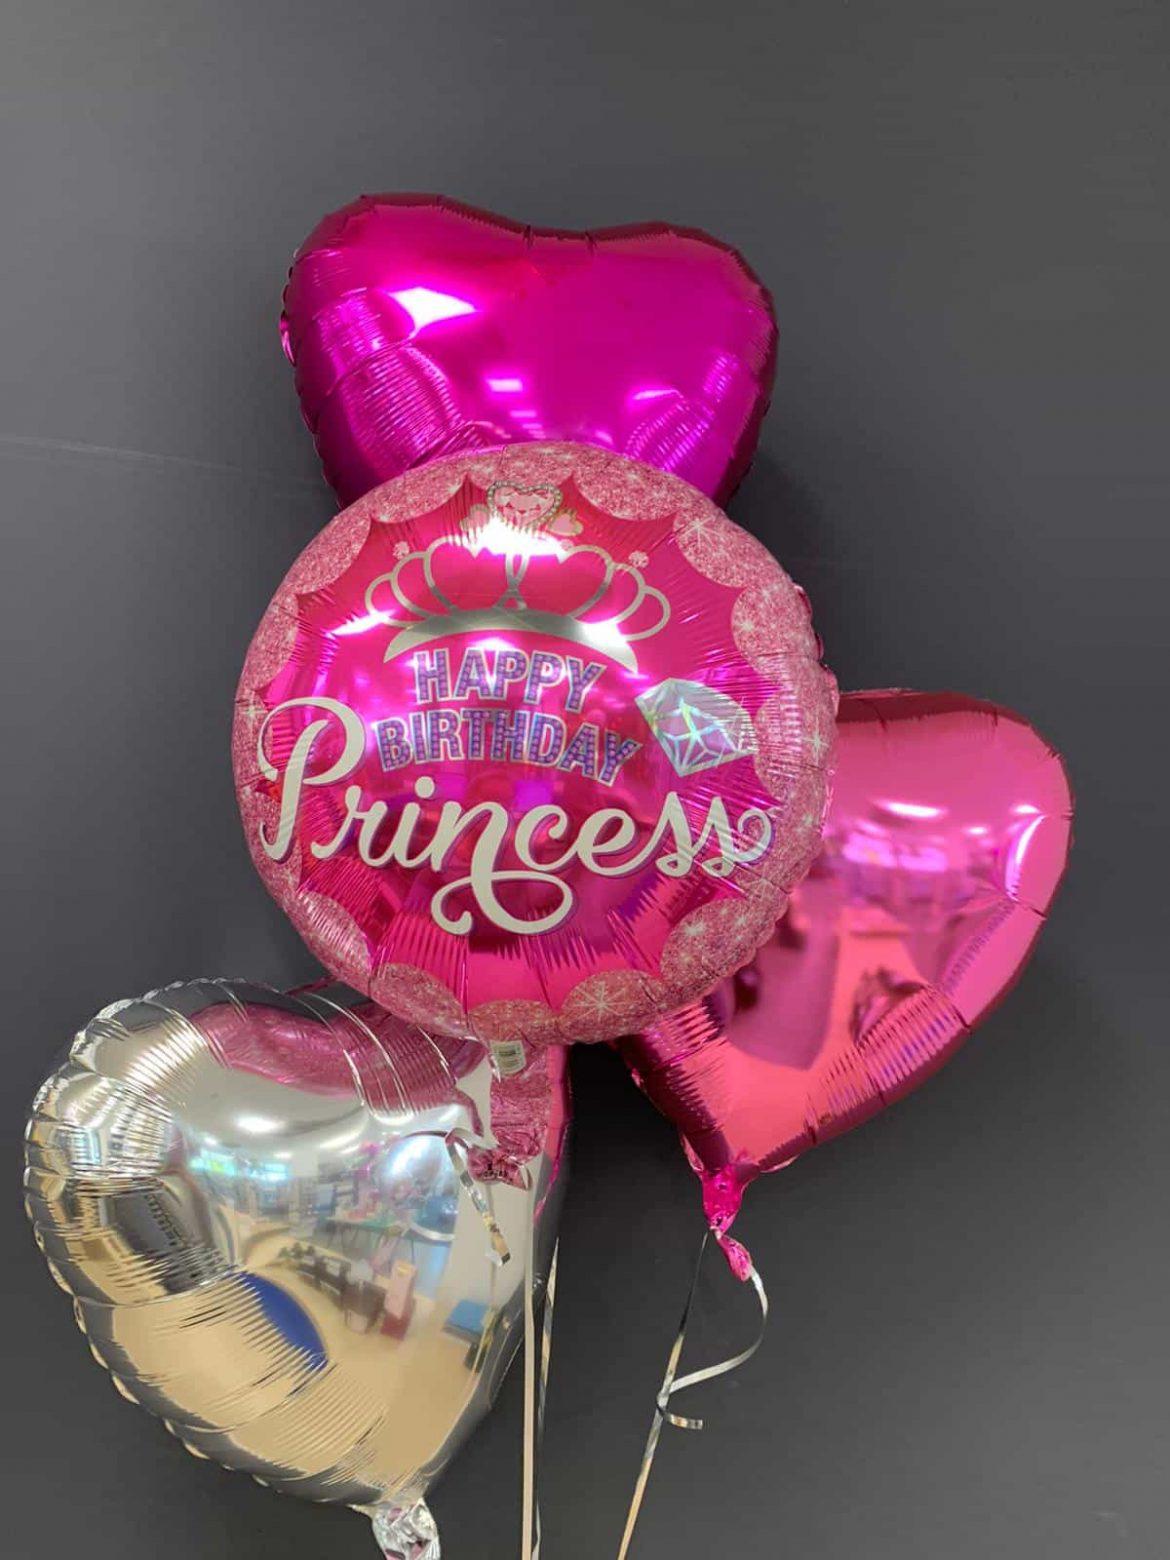 Birthday Princess € 5,50<br />Dekoballon € 4,50 1